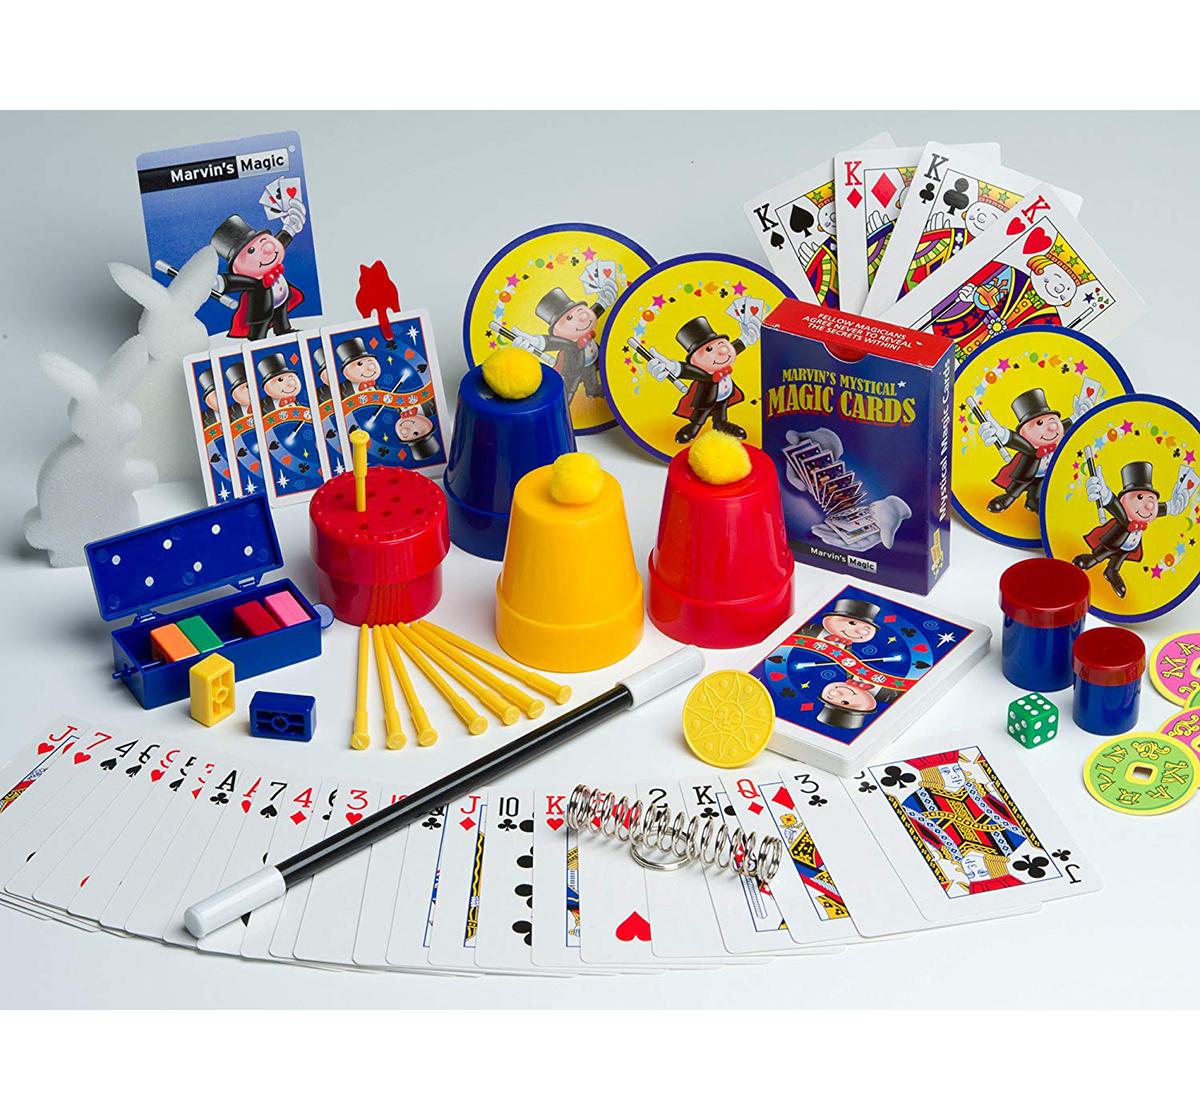 Marvin's Magic | Marvin'S Magic Big Box Of Magic Impulse Toys for Kids age 6Y+